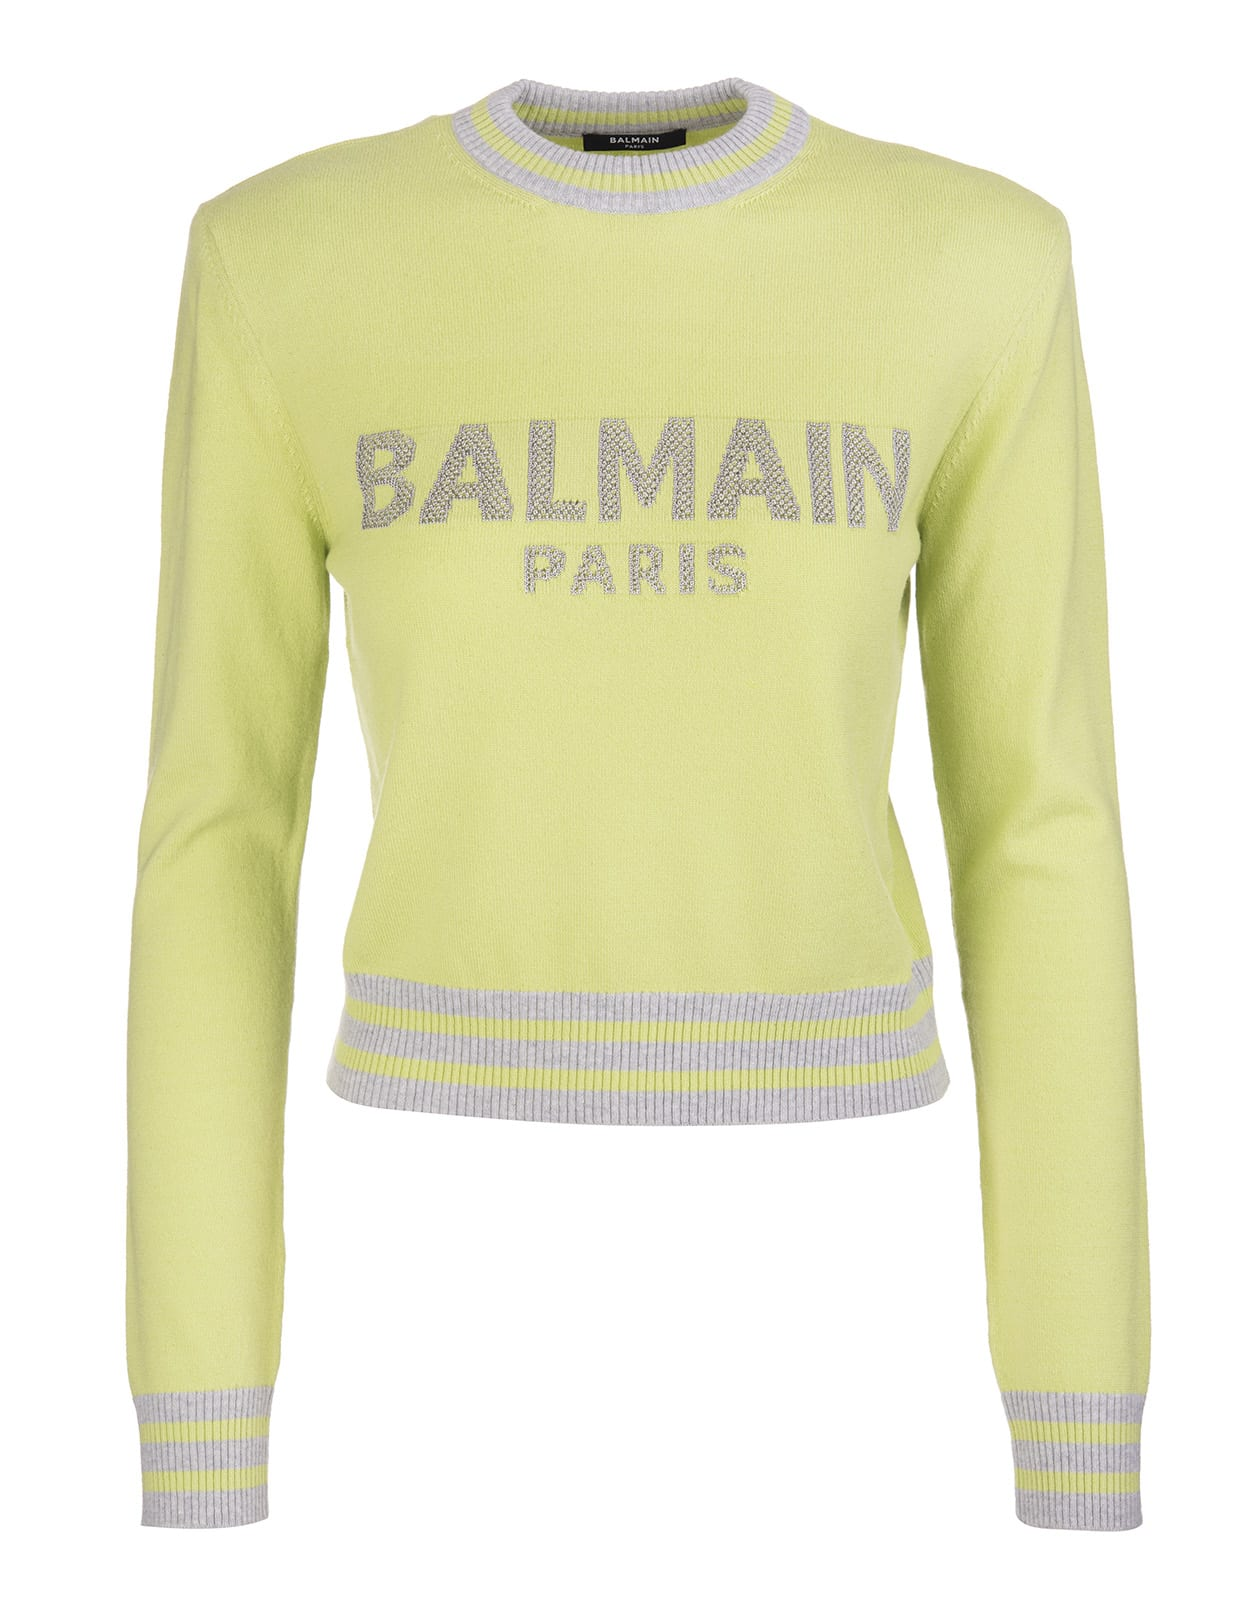 Balmain Lime Green Sweater With Silver Lurex Logo